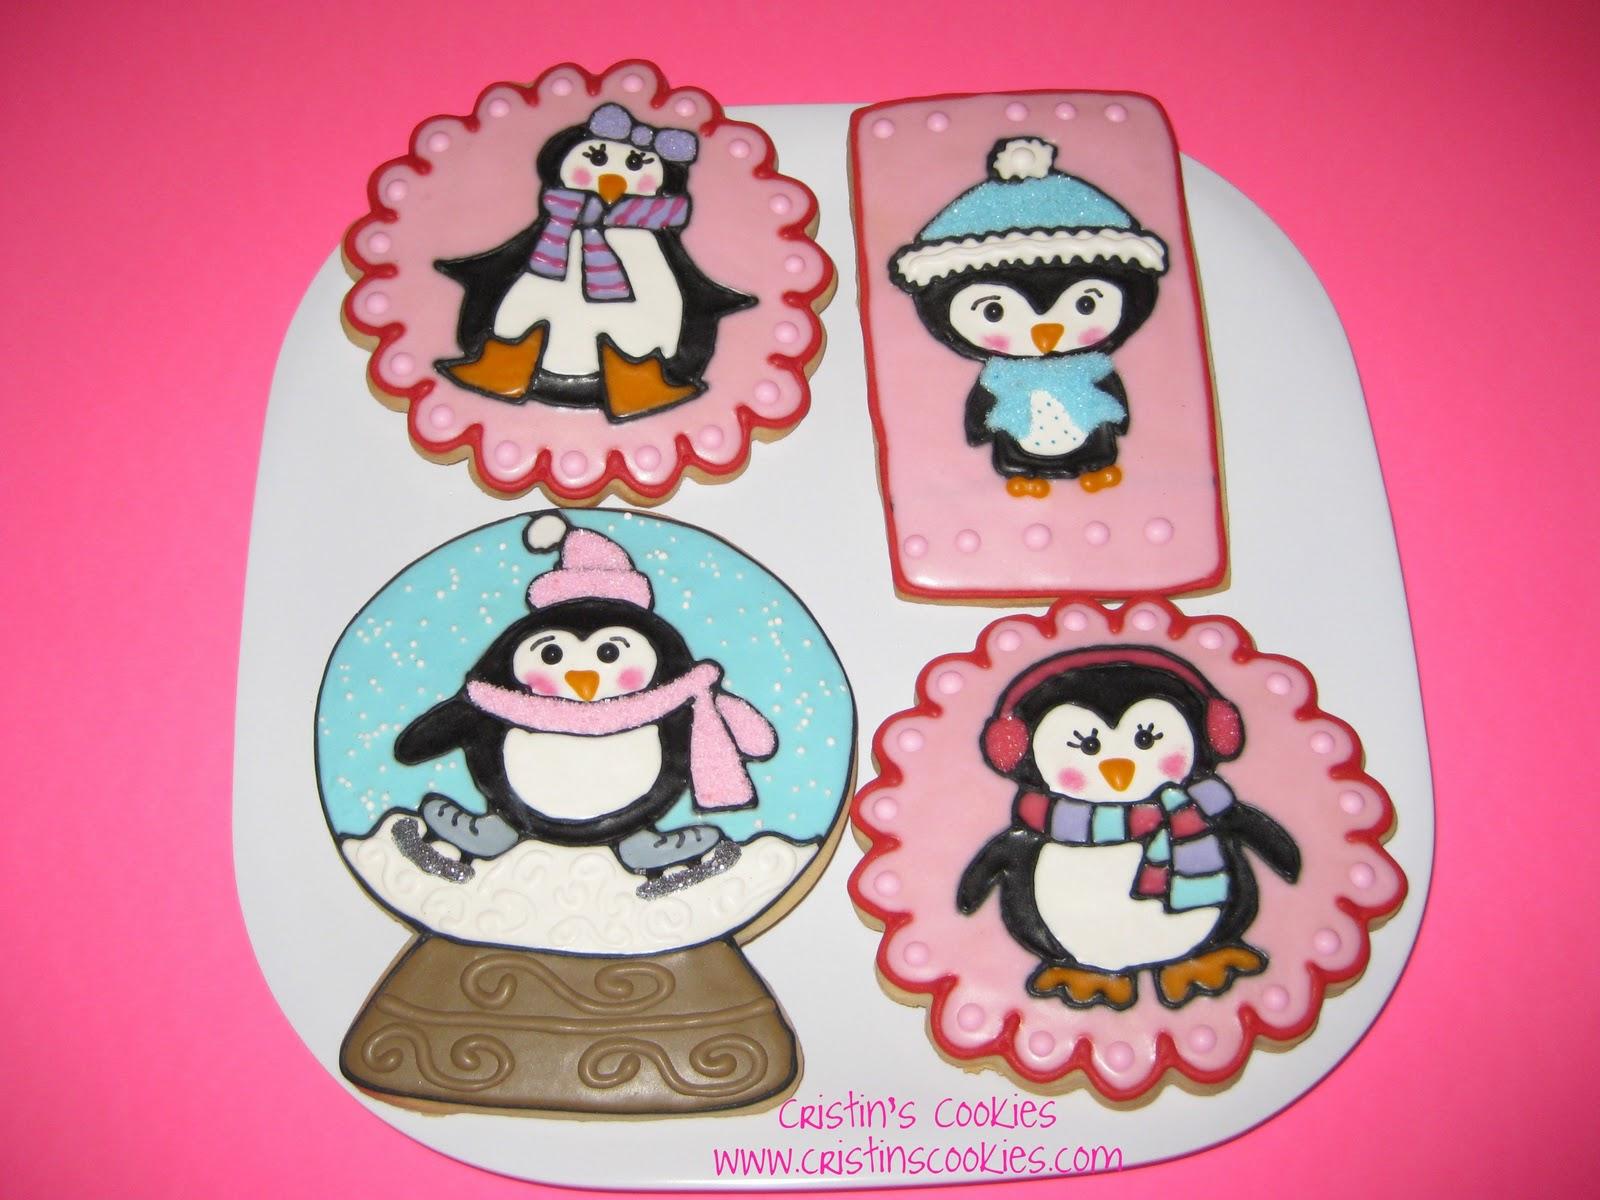 Cristin S Cookies Christmas Cookies Penguins